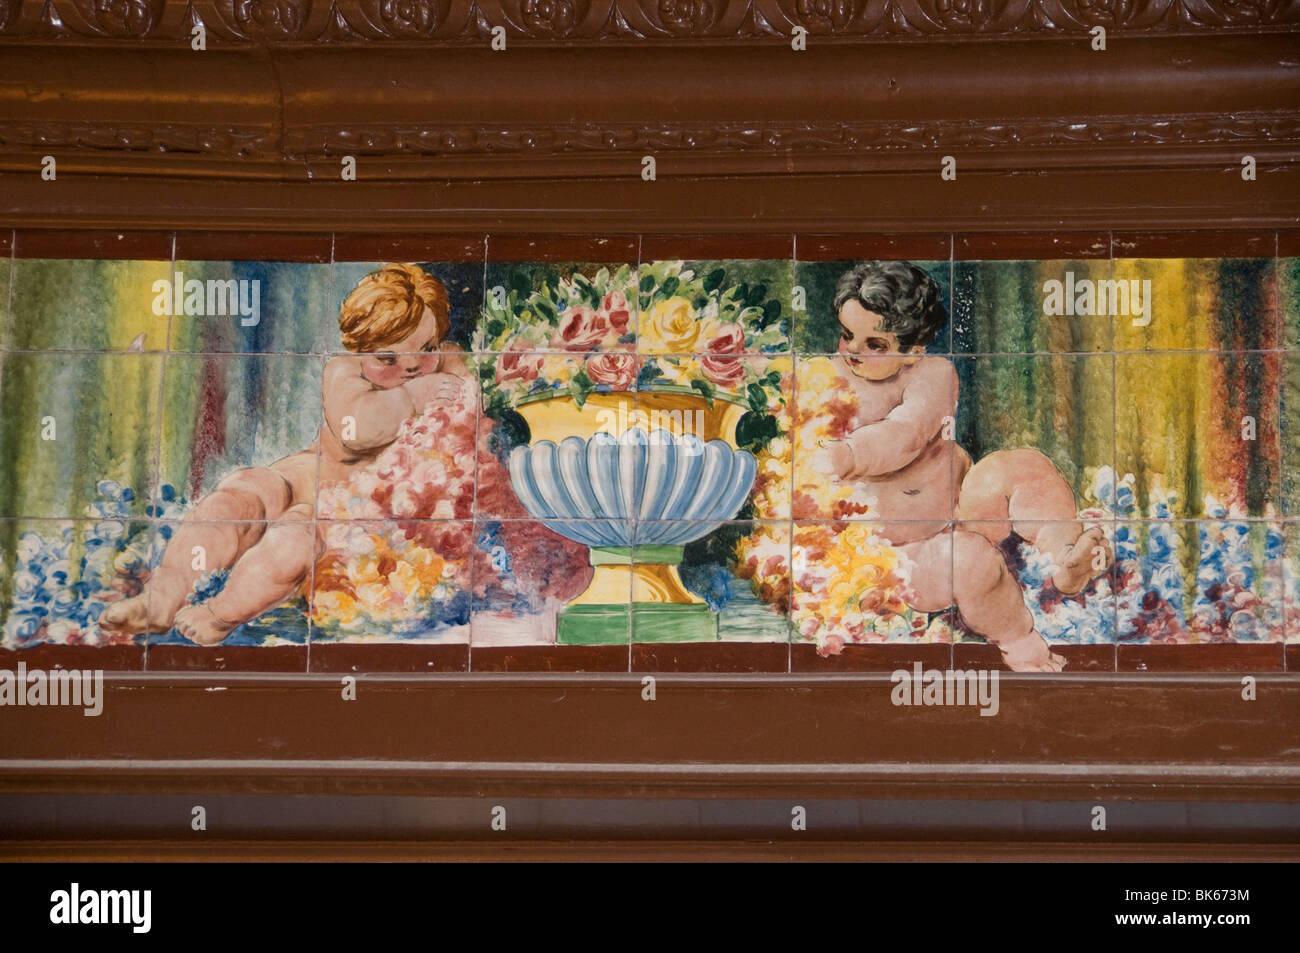 Spain Spanish Madrid wall tiles Villa Rosa - Stock Image